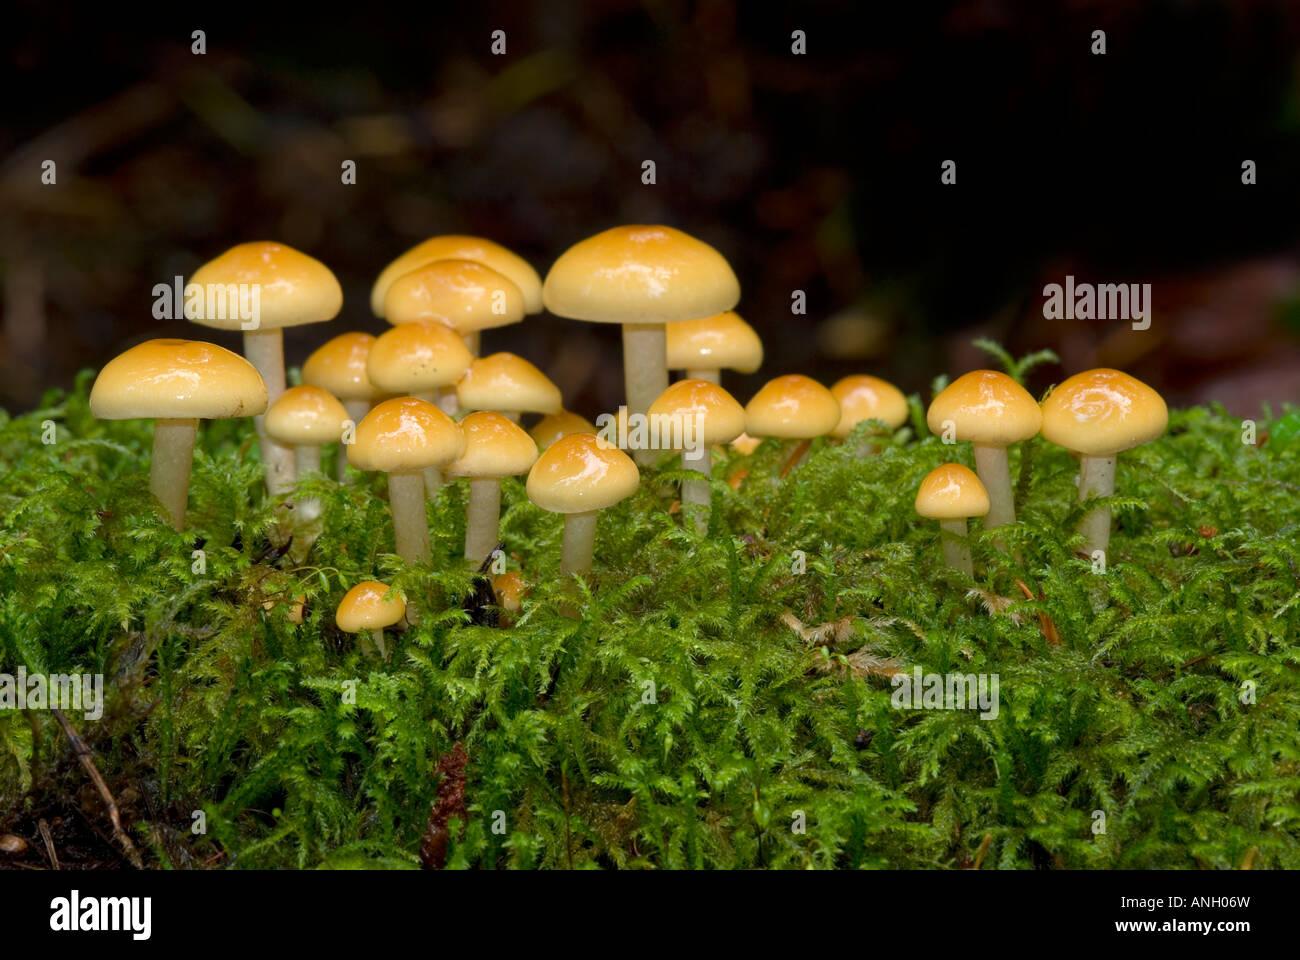 Hypholoma-species of fungus, Vancouver Island, British Columbia, Canada. - Stock Image